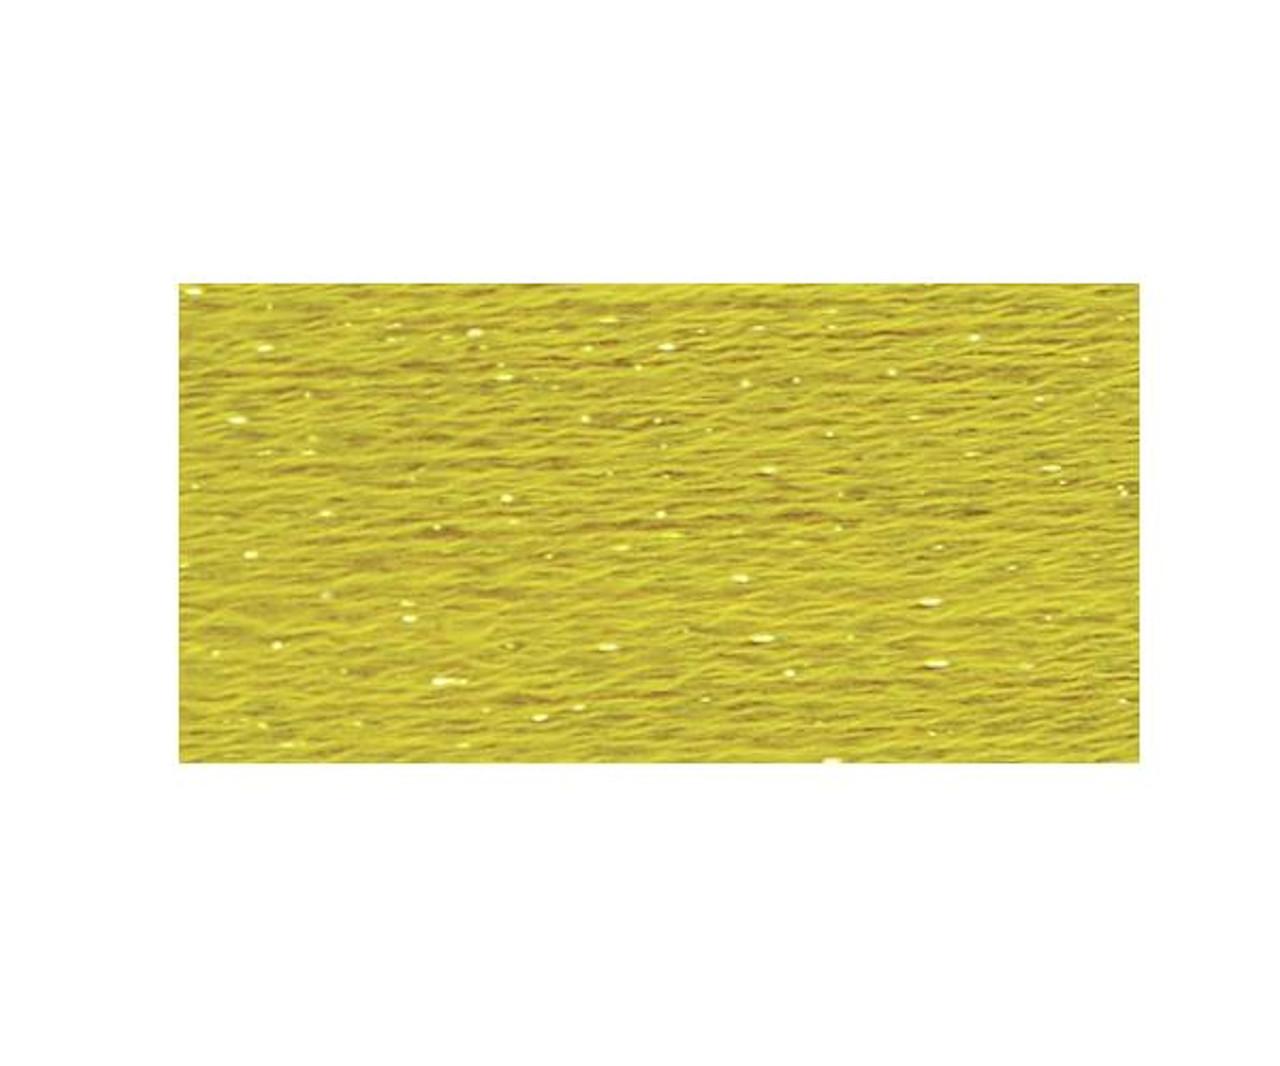 DMC Etoile Floss #C444 - Dark Lemon